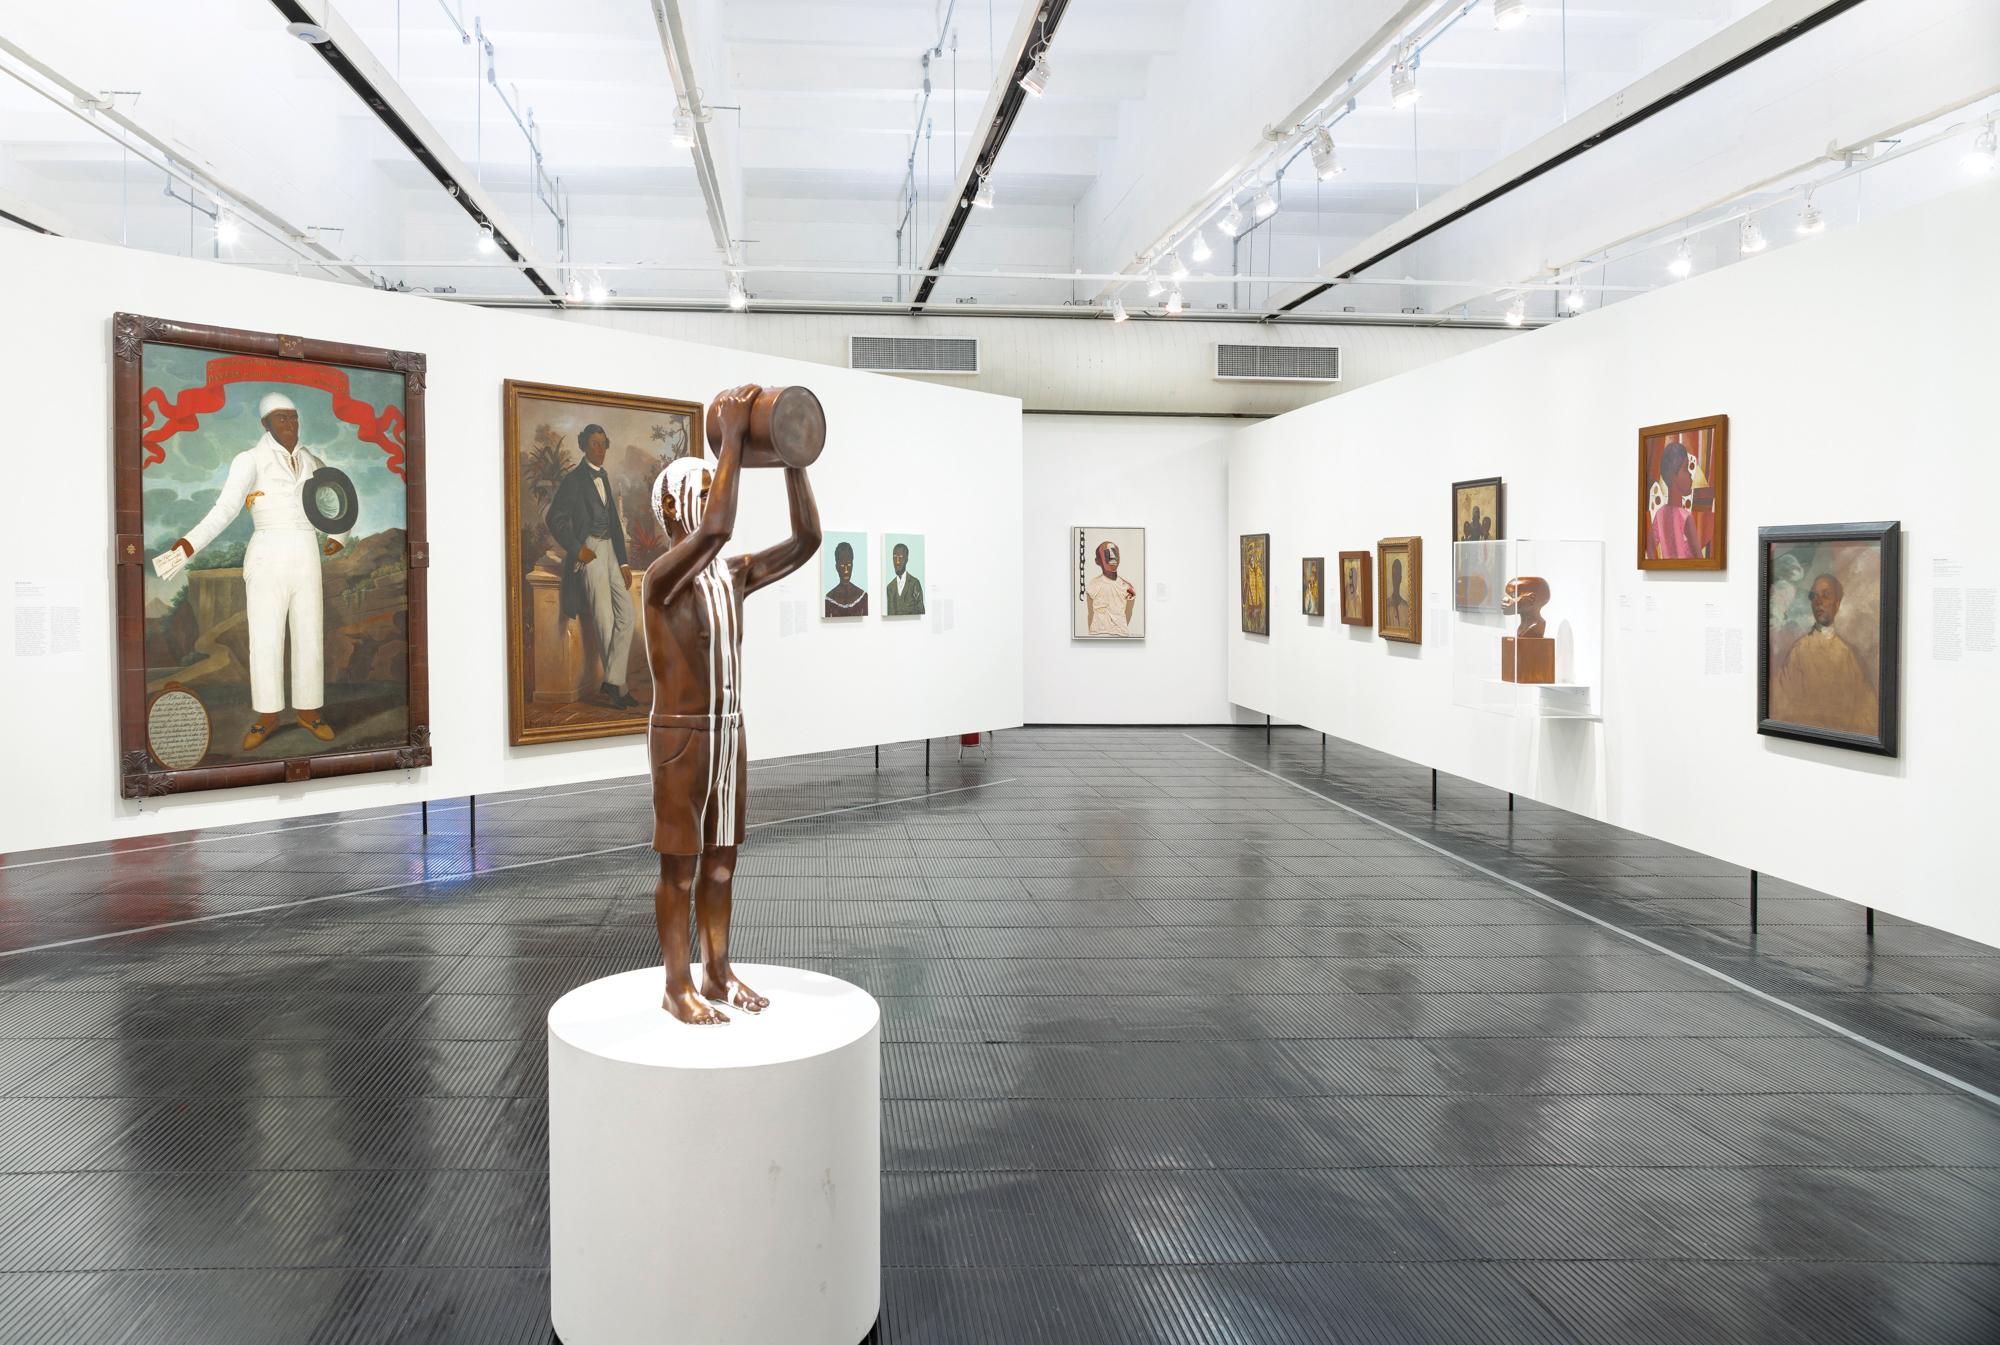 KickstARTing Creativity: Revolutions and Art Museums